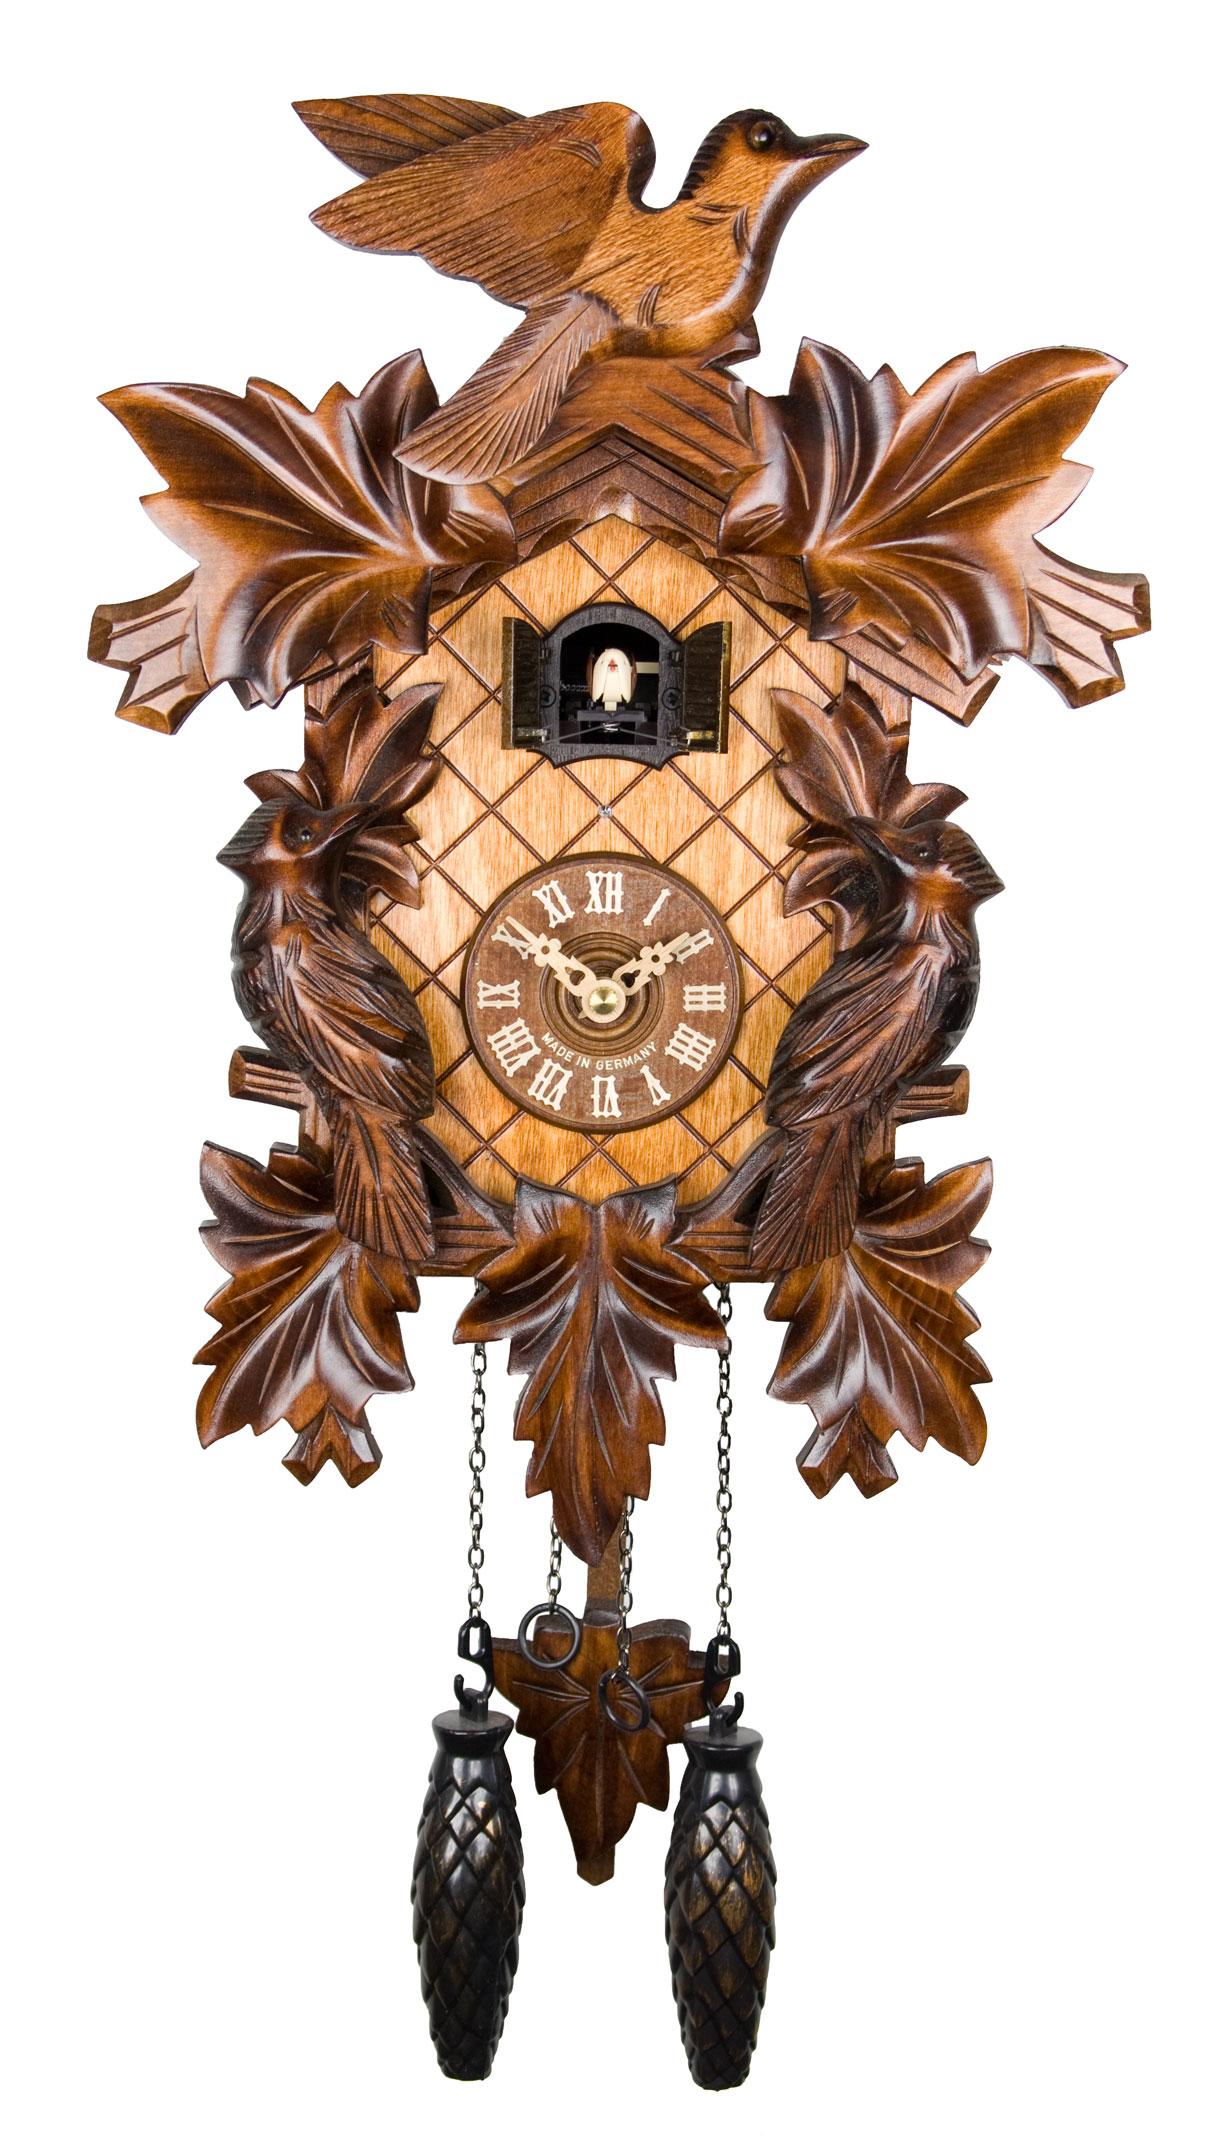 Cuckoo clock shop adolf herr quartz cuckoo clock the cuckoo bird - Cuckoo bird clock sound ...